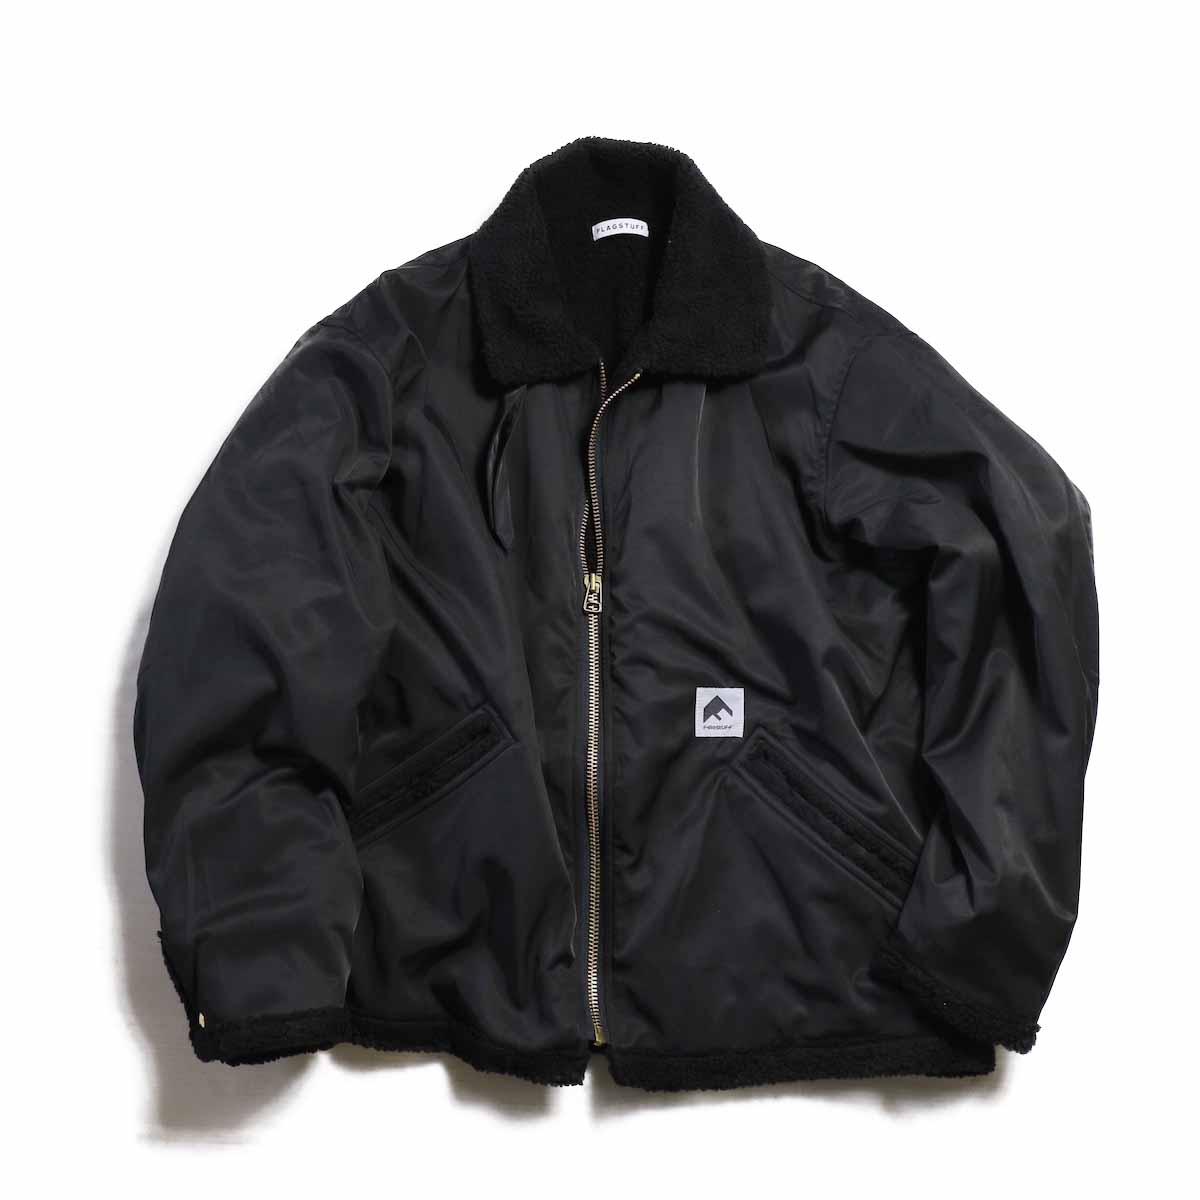 F-LAGSTUF-F / NYLON B-3 -BLACK(NO PRINT)